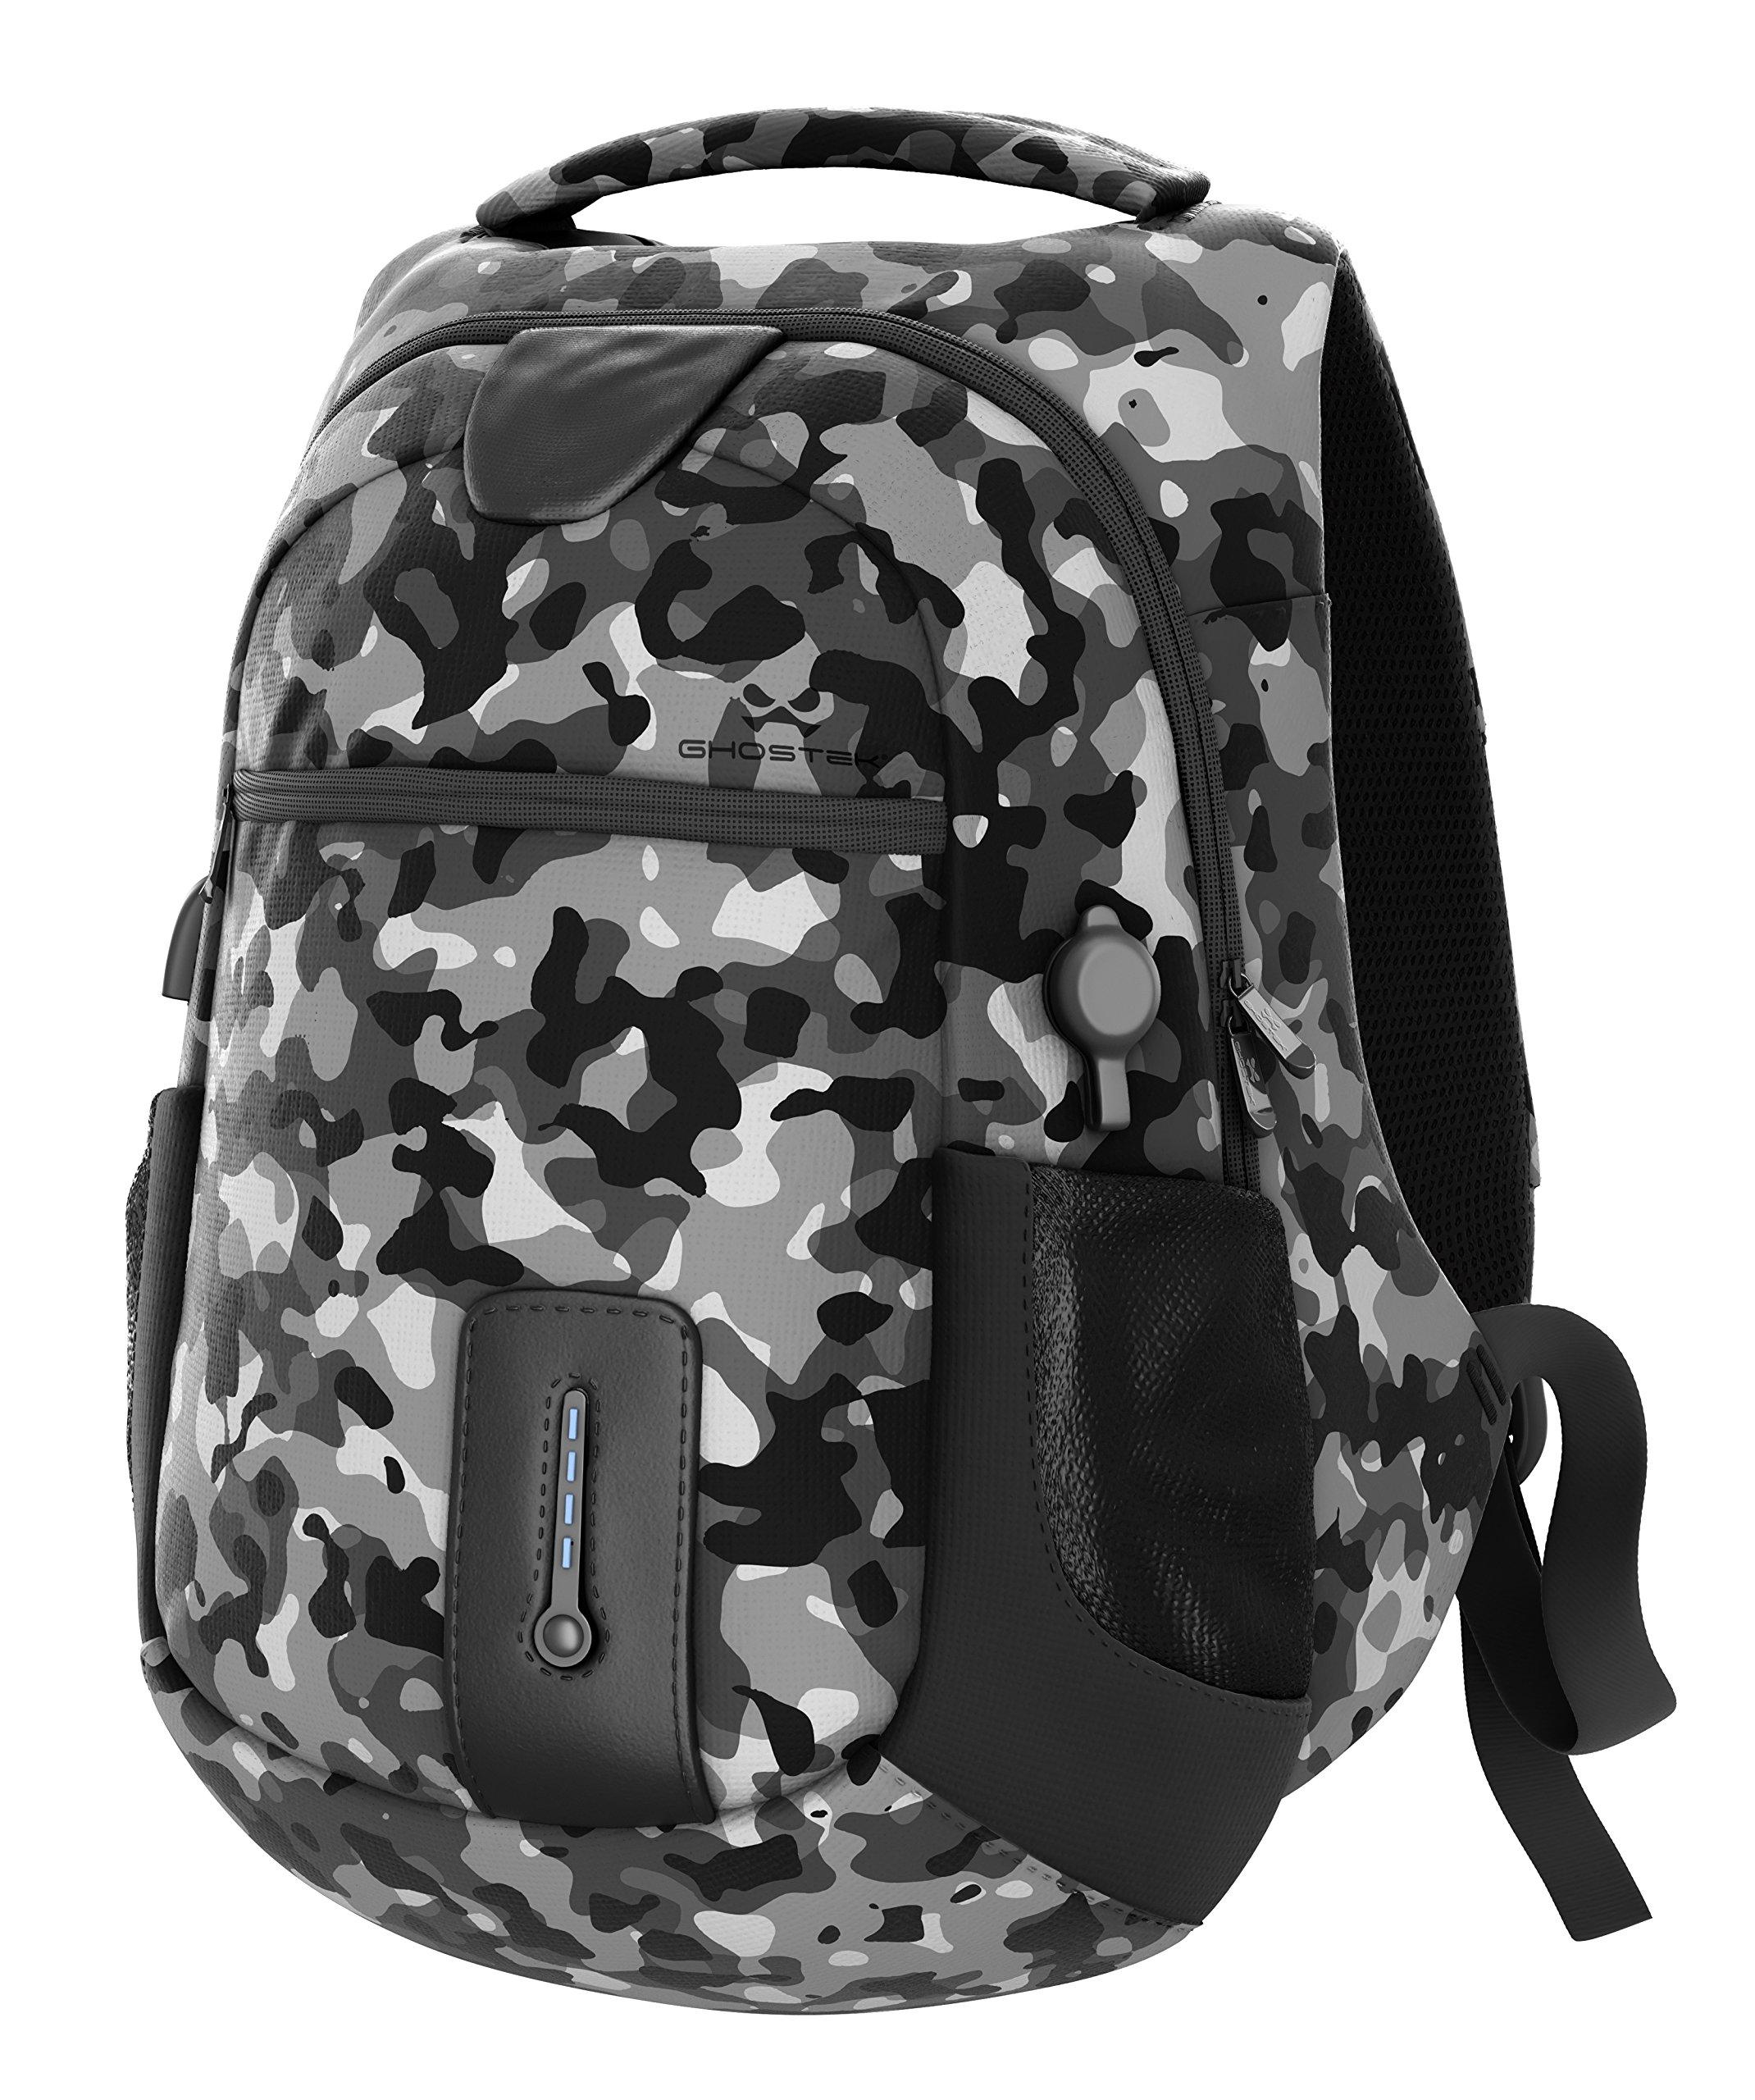 Ghostek NRGbag Series Computer Laptop Messenger Backpack Book Bag + Power Bank | Water Resistant | 7000mAh | Lightweight | Multipurpose | Laptops Up To 15.6'' | iPhone Macbook (Gray Camo) by Ghostek